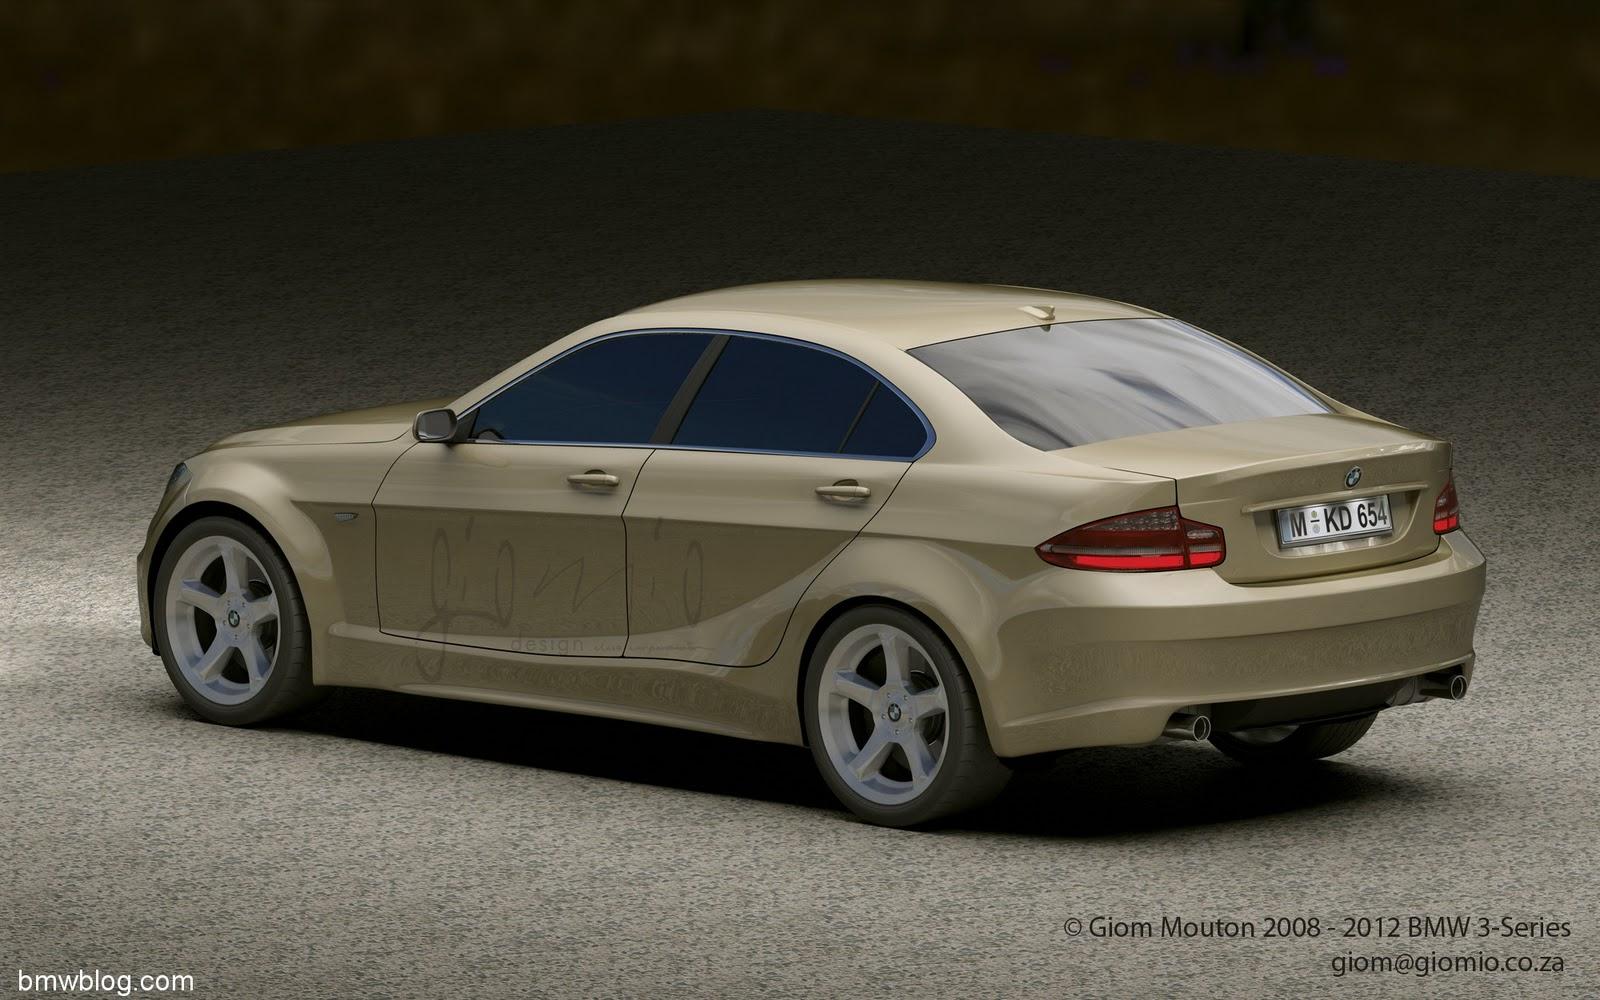 http://3.bp.blogspot.com/-Nr3H-gv38hs/TZyEJ8Mpe1I/AAAAAAAAANI/ZFQUoaM-CPU/s1600/2012-BMW-3Series-3.jpg